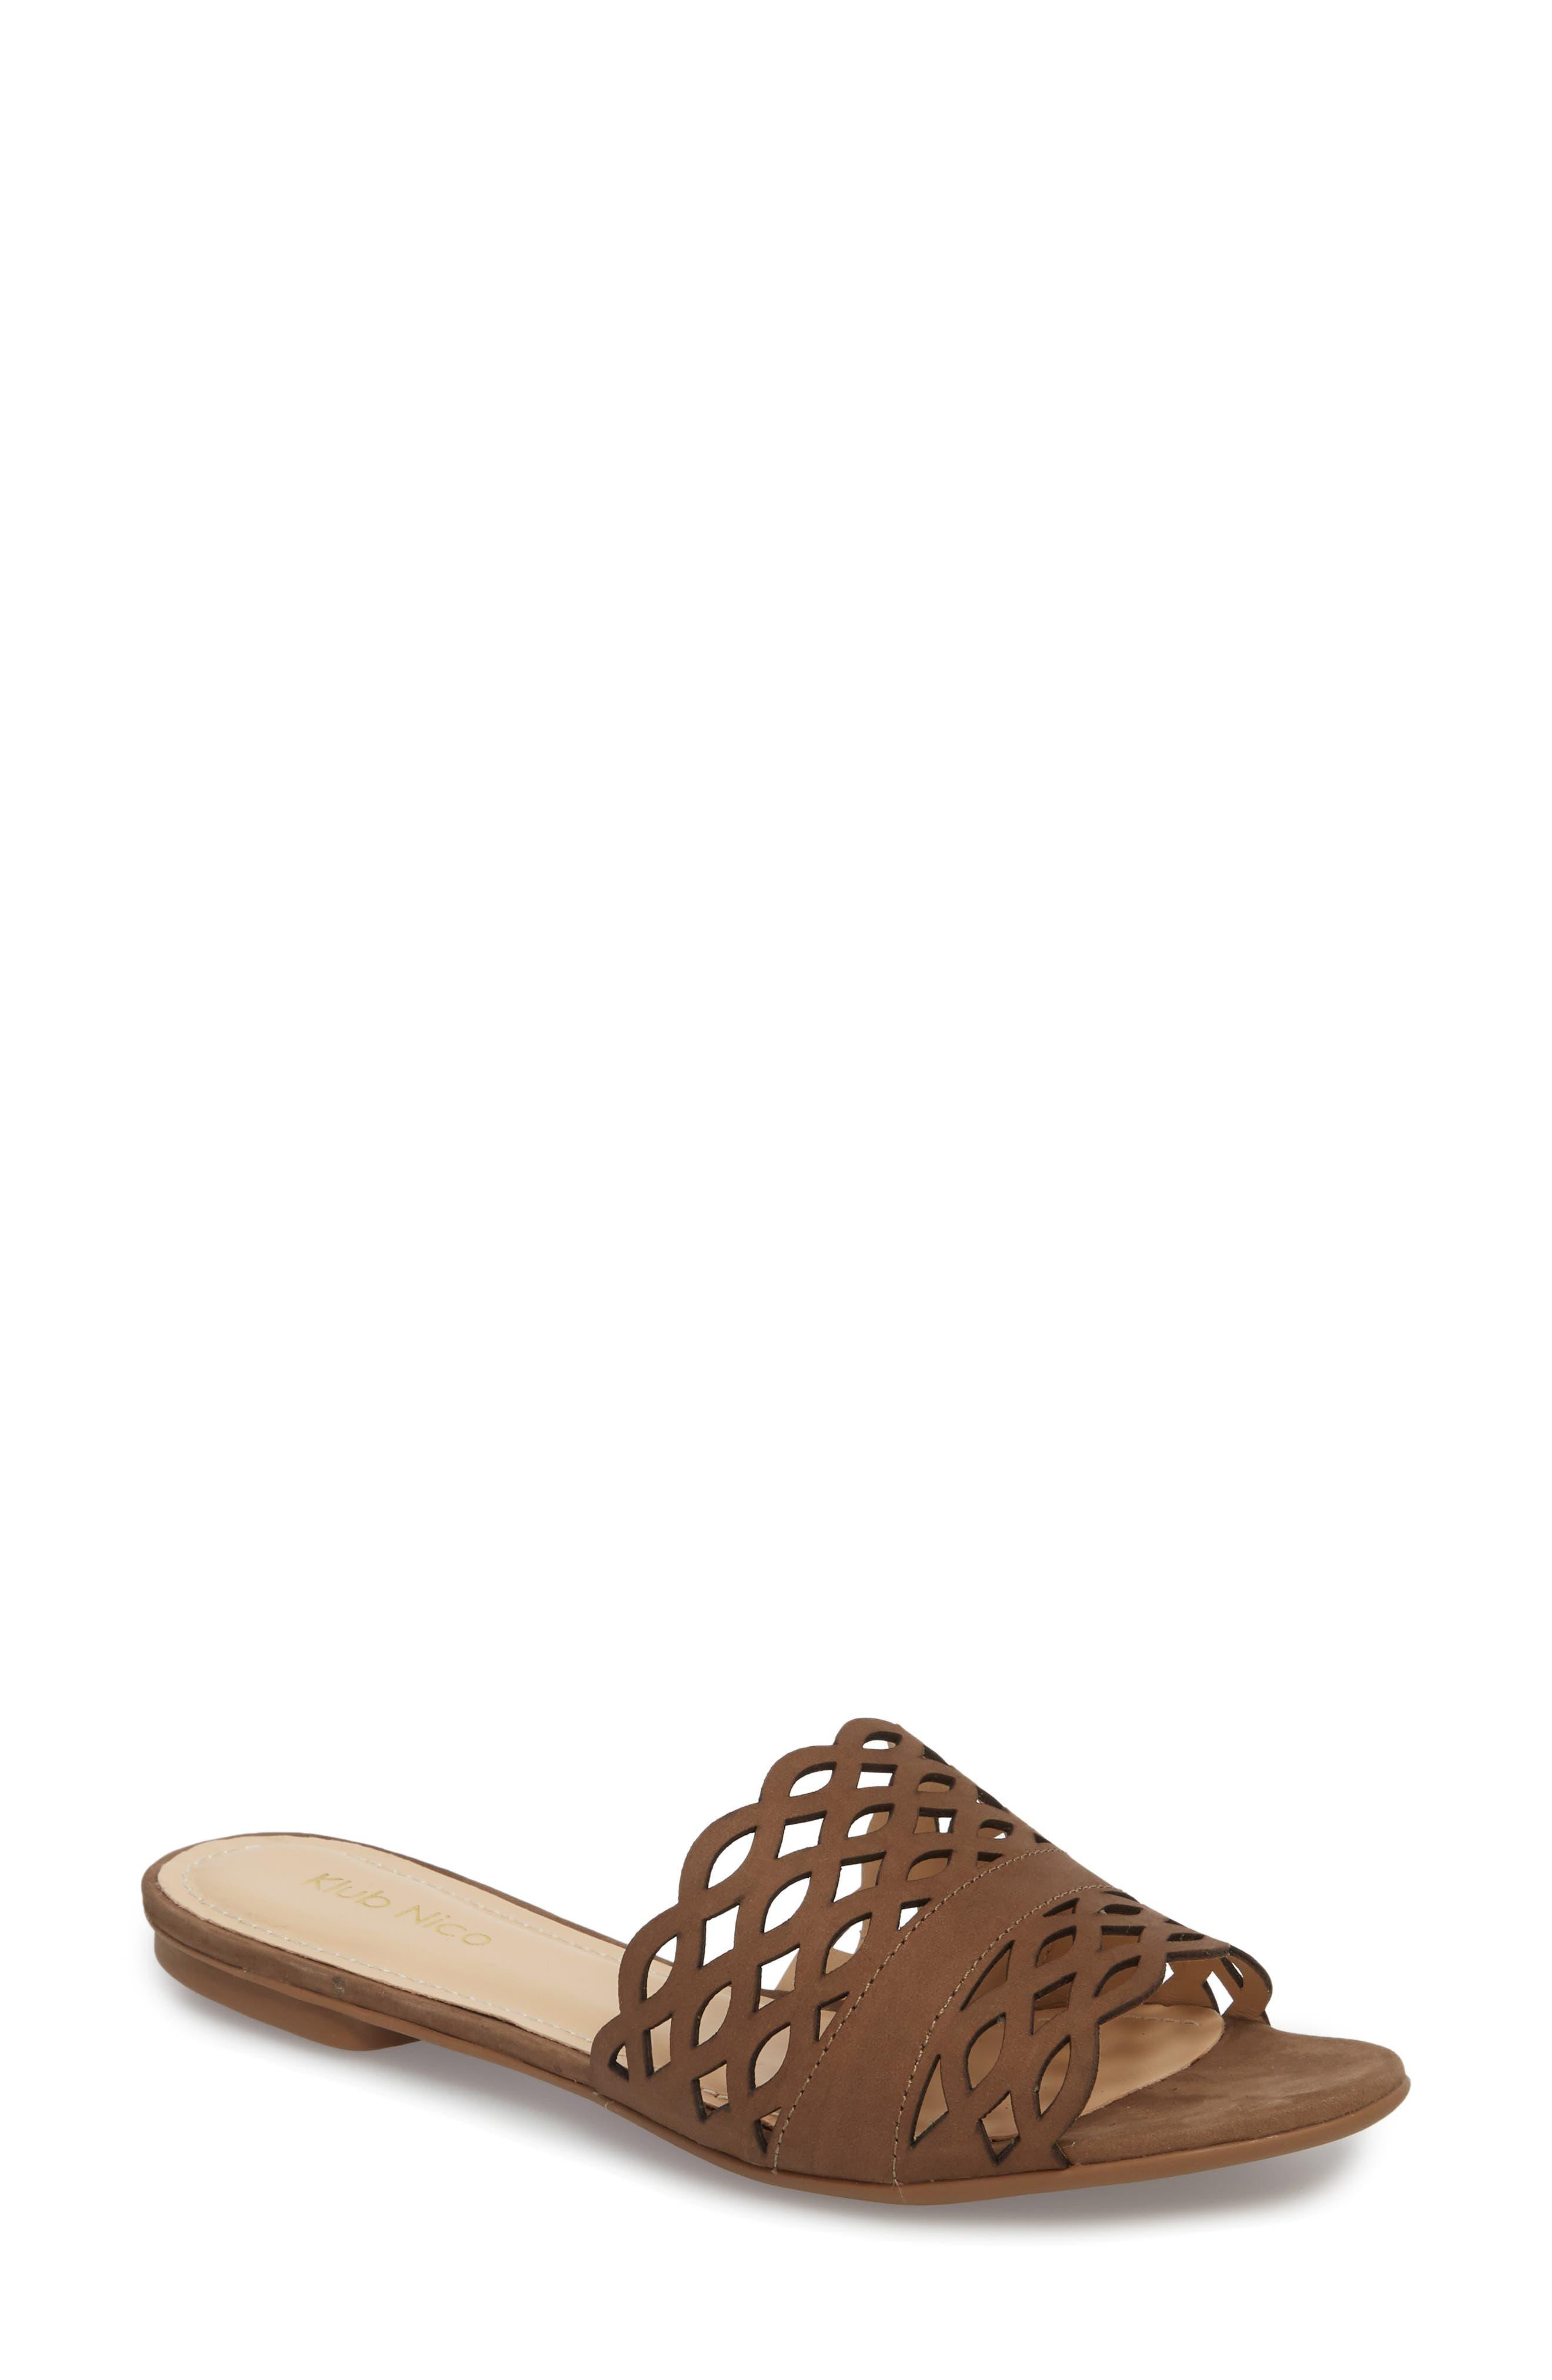 Gynne Slide Sandal,                             Main thumbnail 1, color,                             Truffle Leather